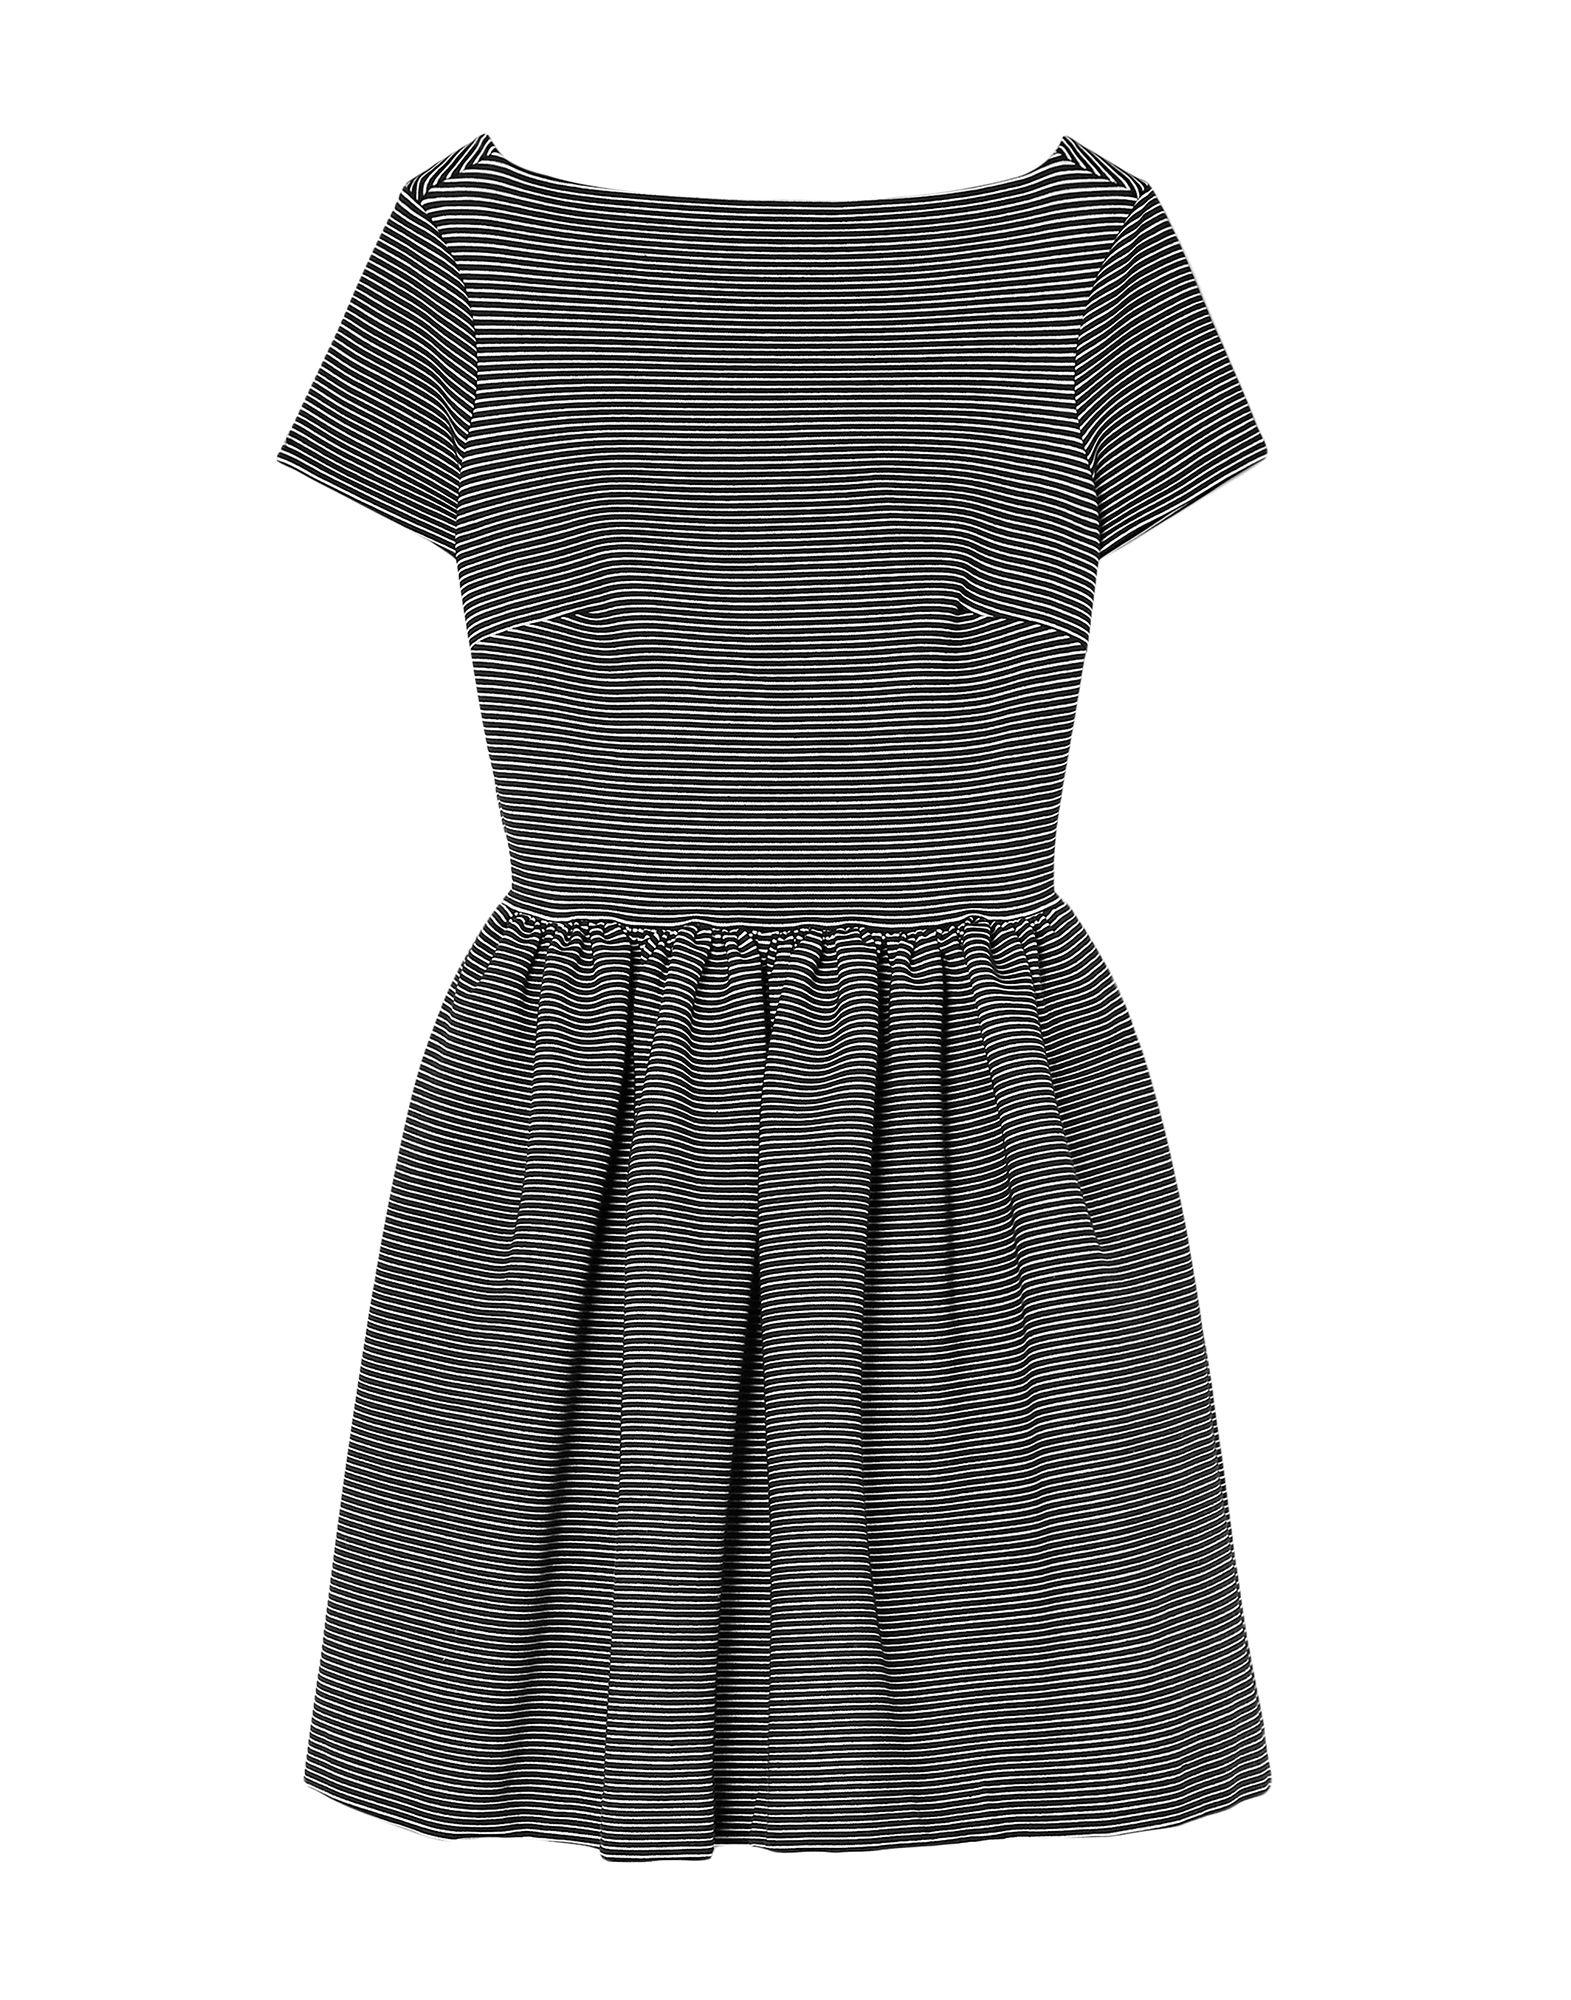 Фото - MIU MIU Короткое платье miu miu короткое платье